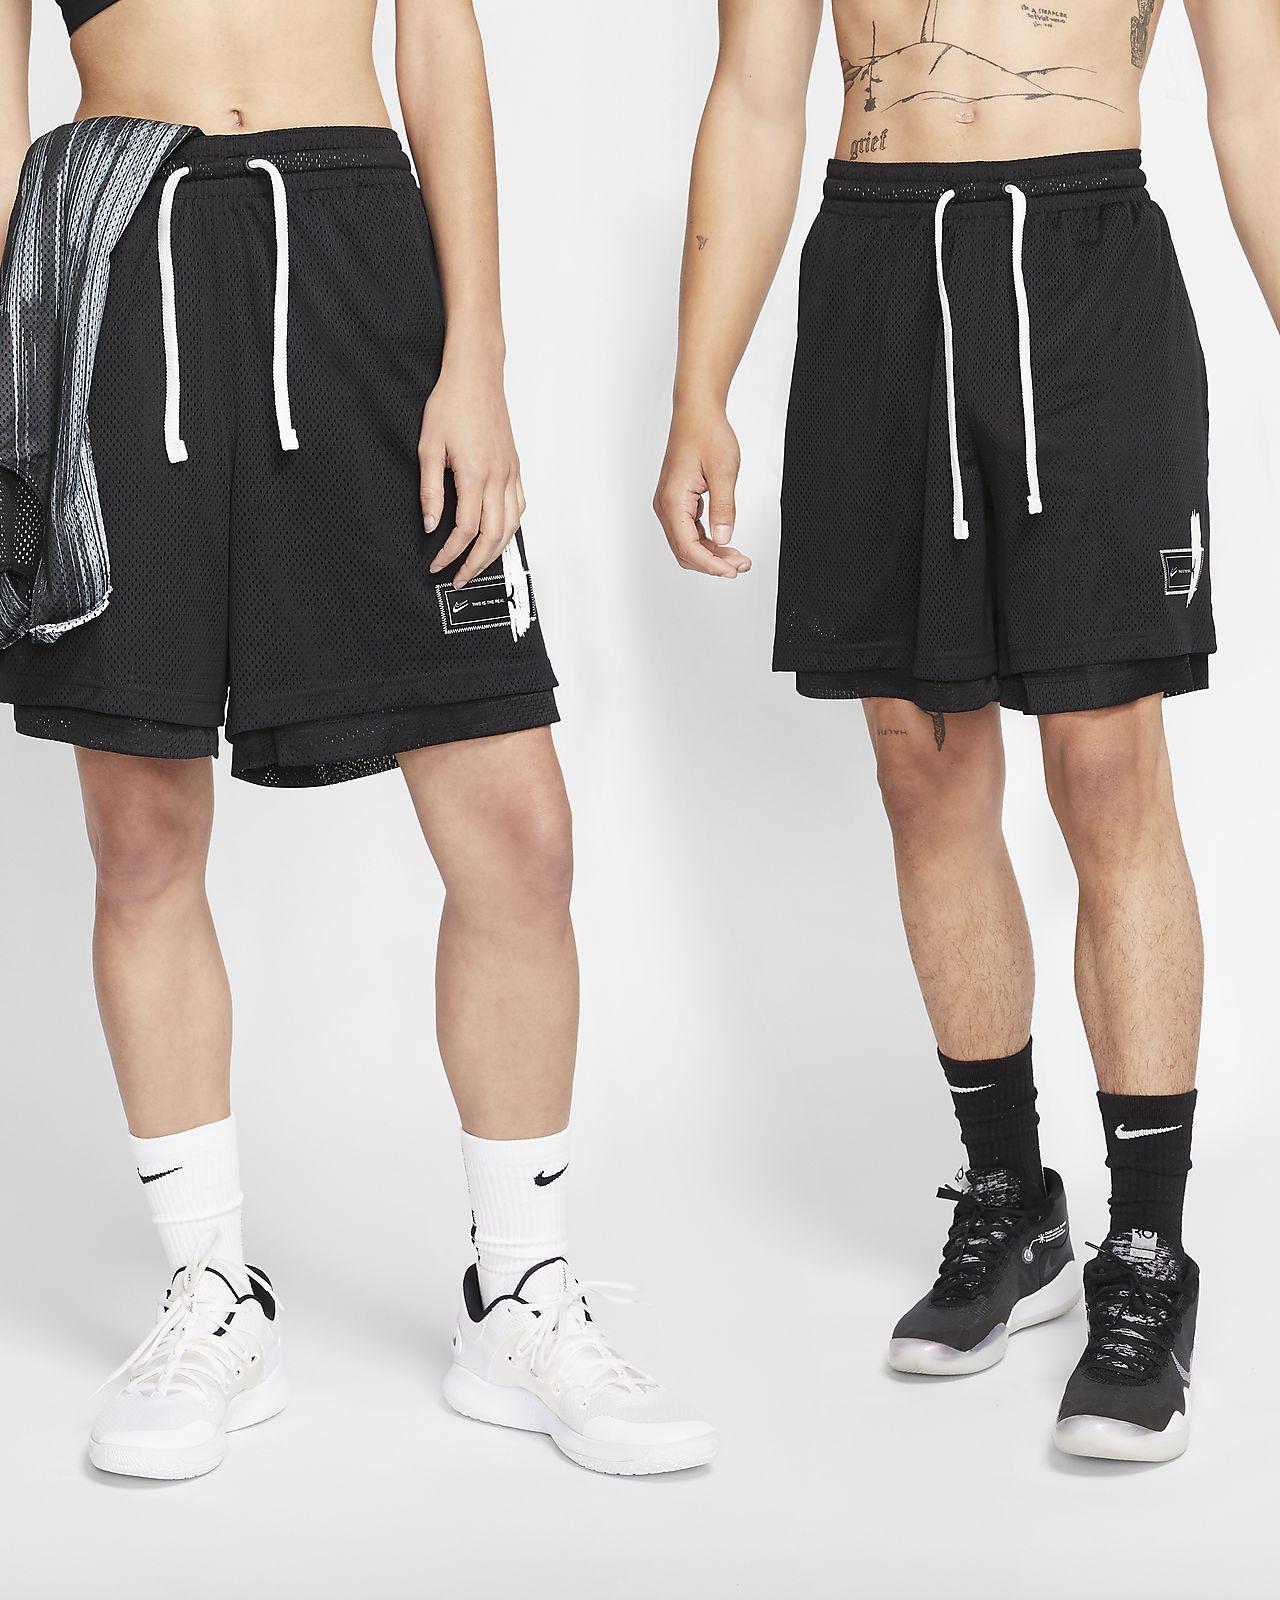 KD Nike Basketball Shorts